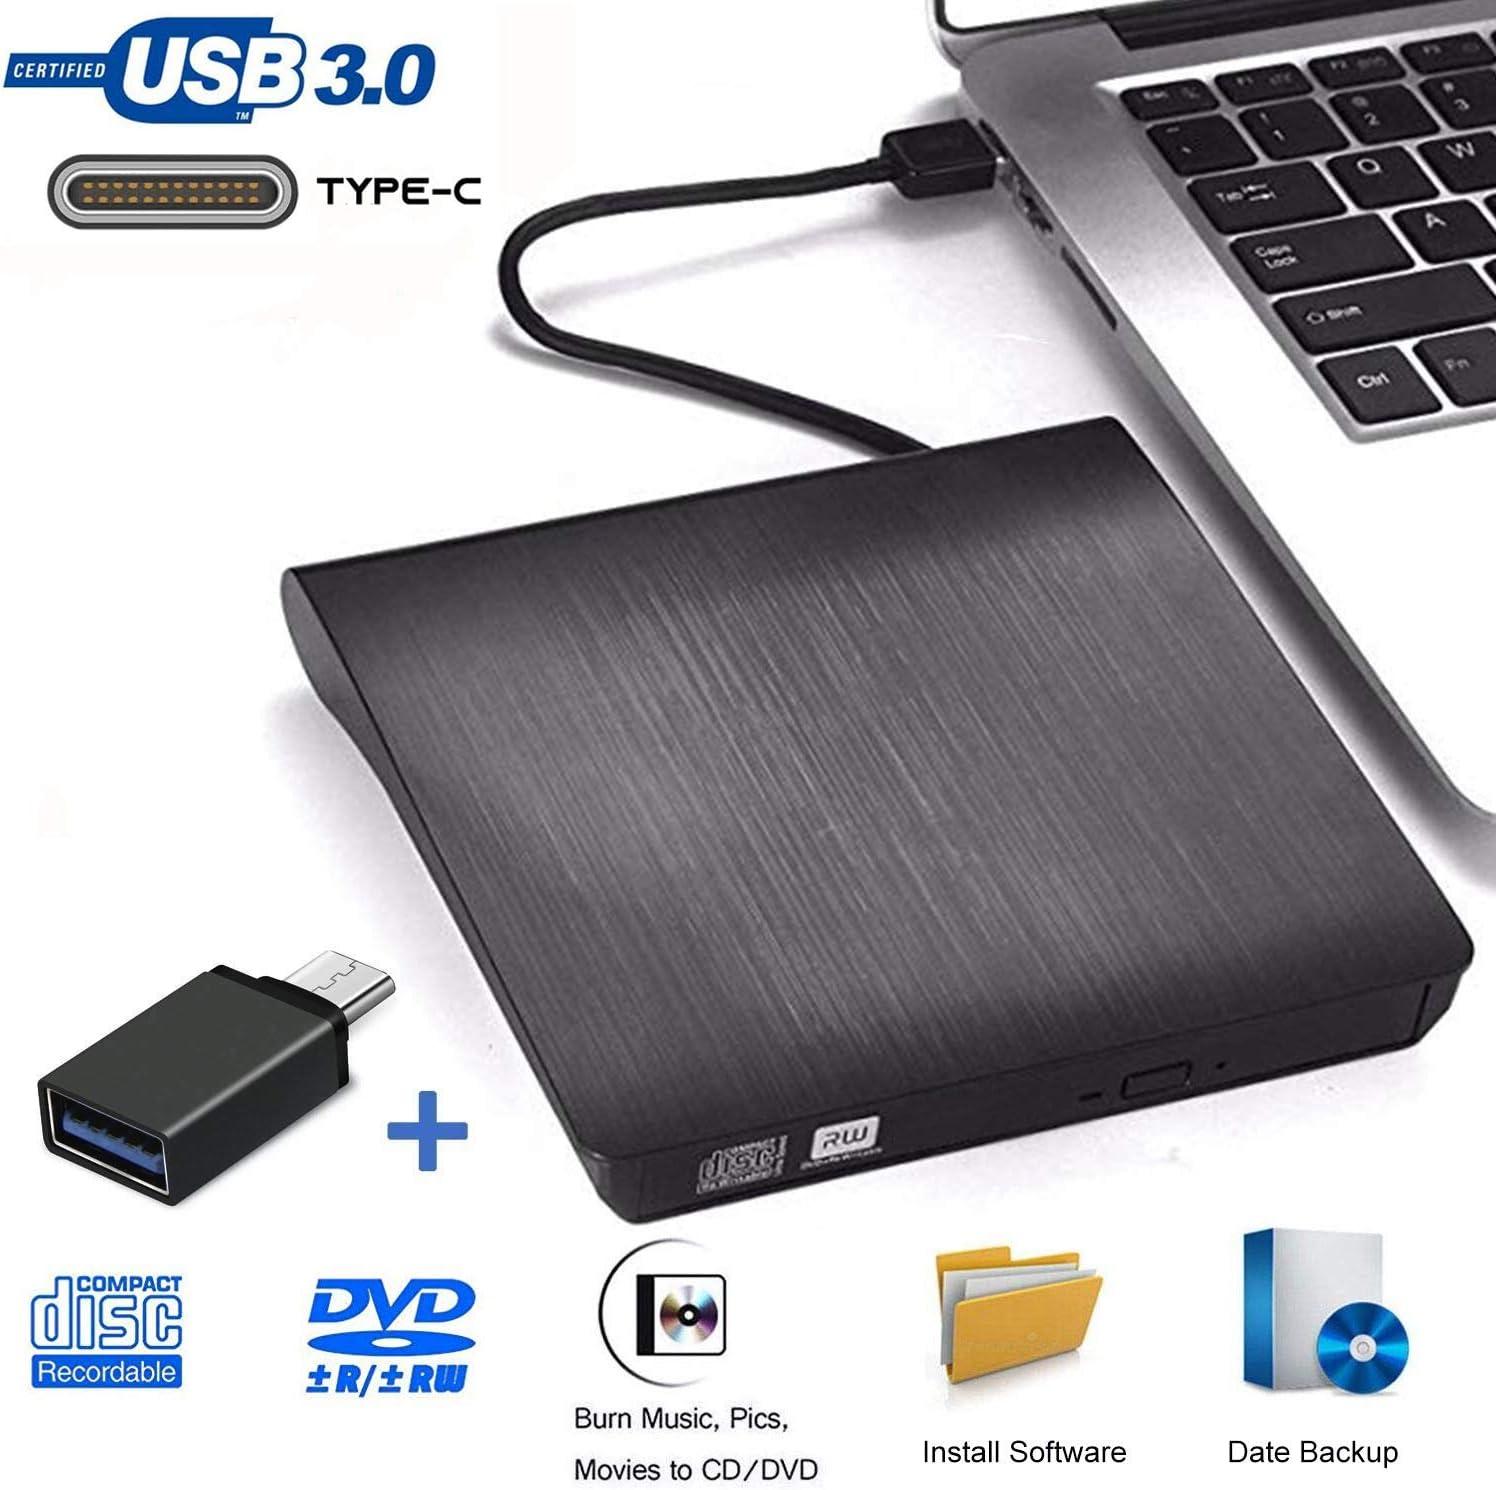 Grabadora DVD Externa, iAmotus Unidades CD/DVD Externas USB 3.0 Lector Grabadora Y Tipo-c Grabadora Externa Ultra Slim Portátil para Windows 10 7/8 / Vista/XP/Mac OS/Macbook/Desktop Linux, Laptop